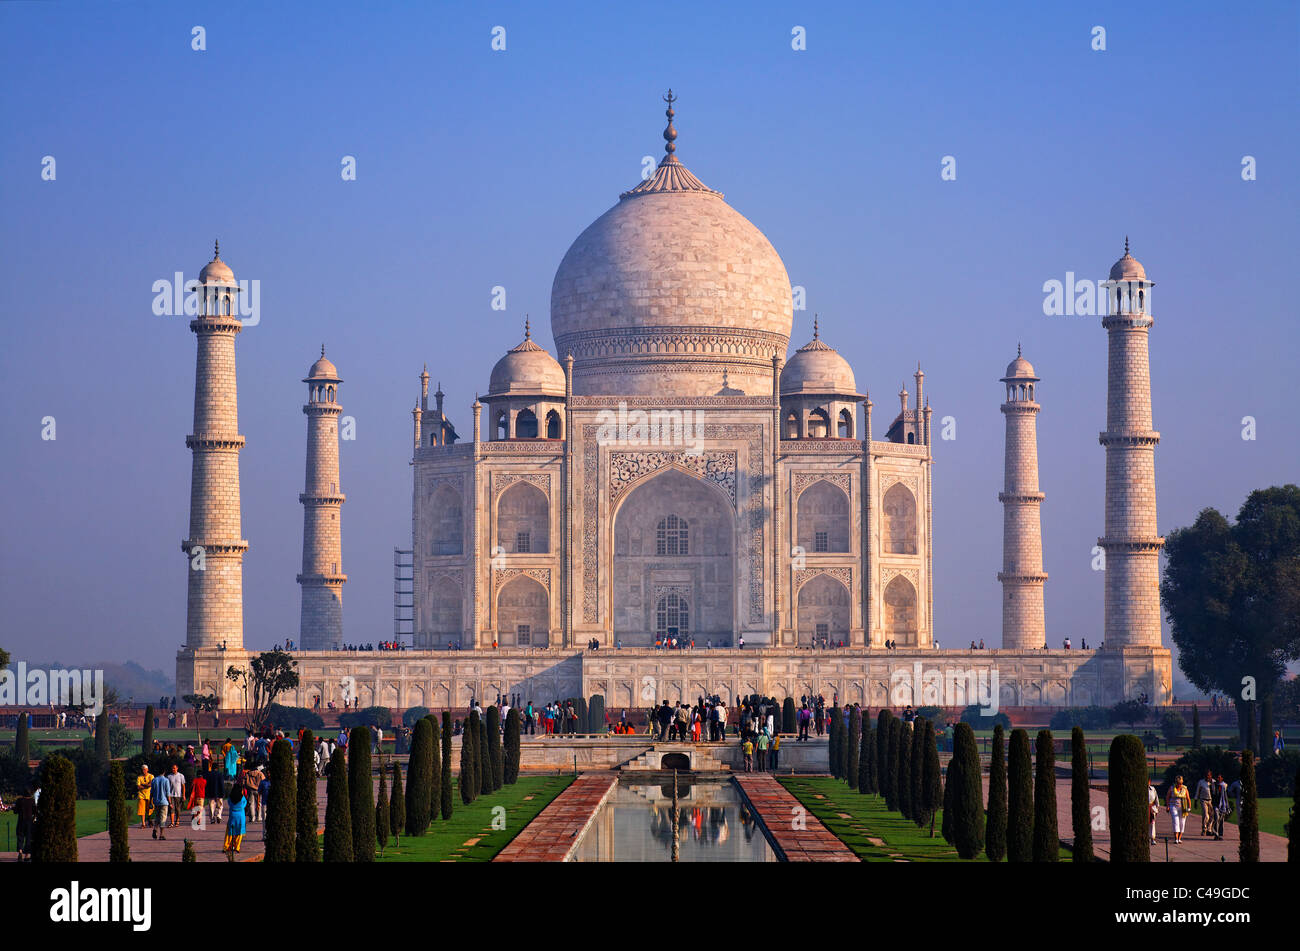 En Uttar Pradesh, India - Agra - El Taj Mahal Imagen De Stock